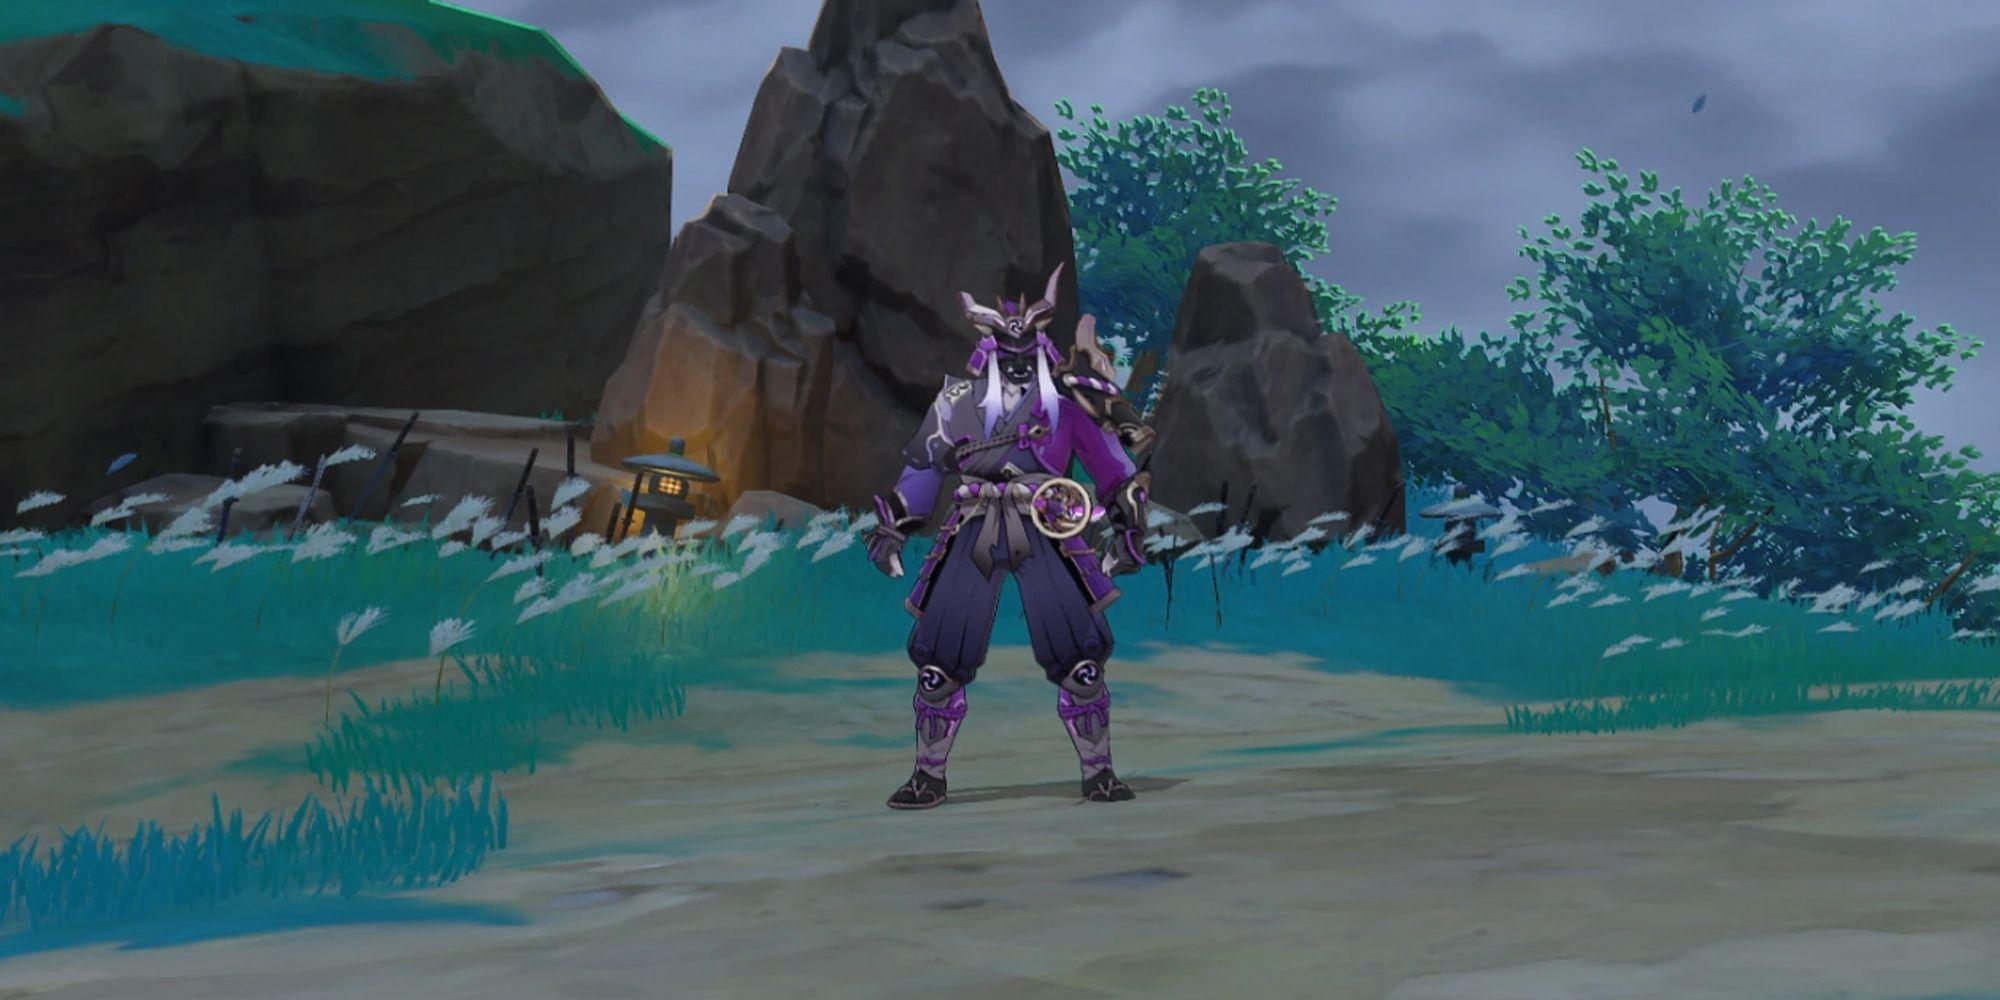 Genshin Impact: How to Find The Nameless Samurai's Blade (Dreams of Sword Art)